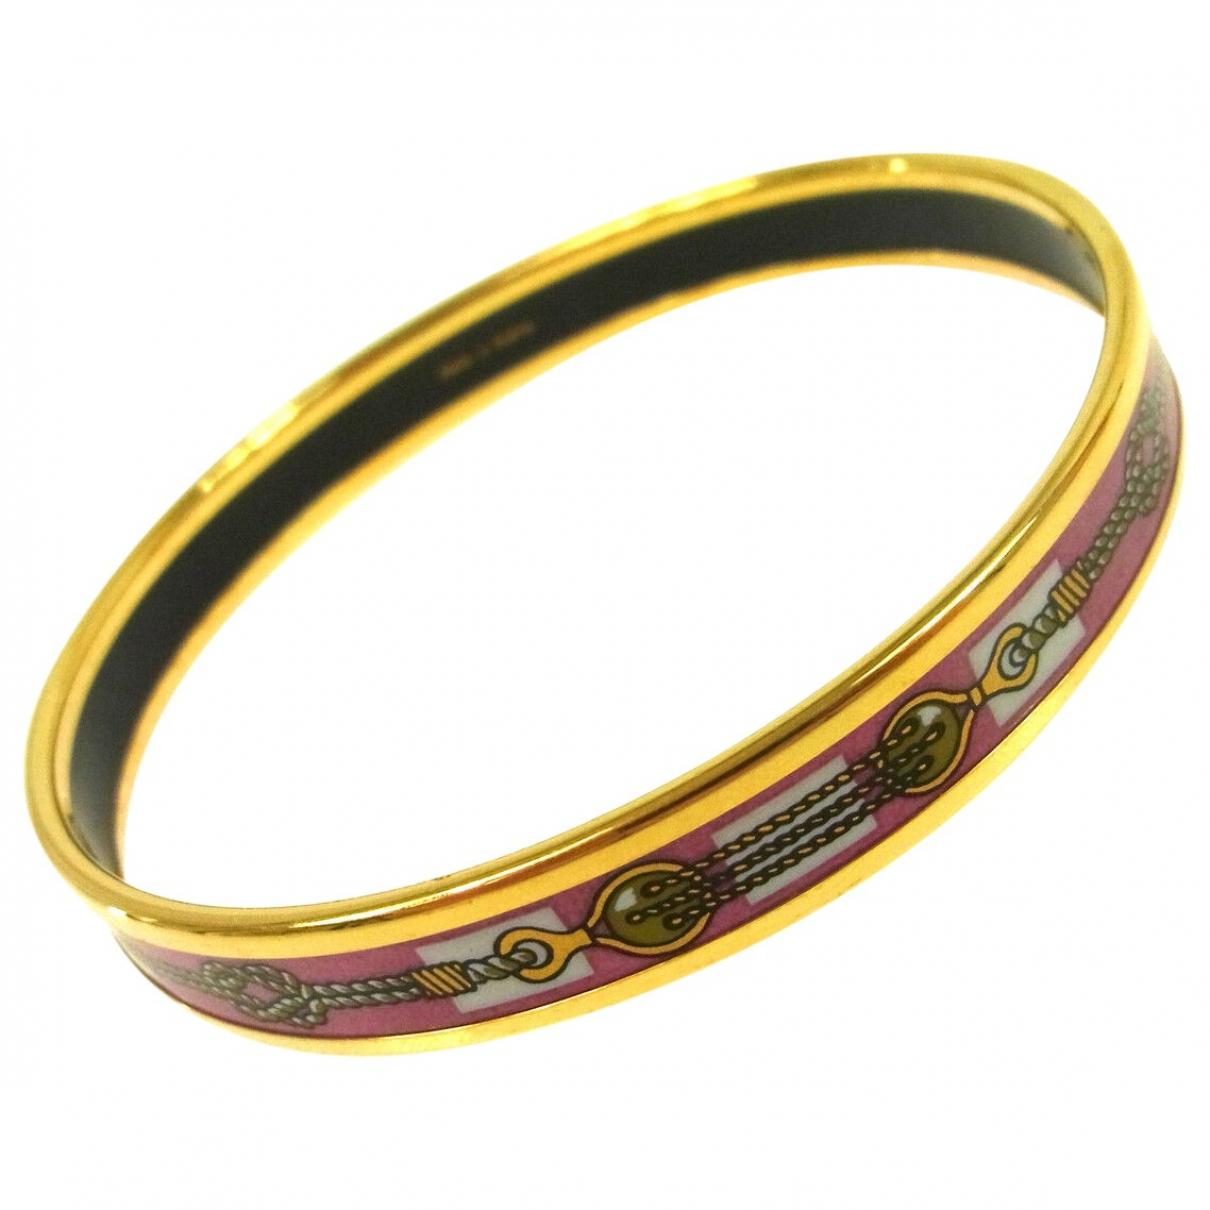 Hermes Bracelet Email Armband in Metall